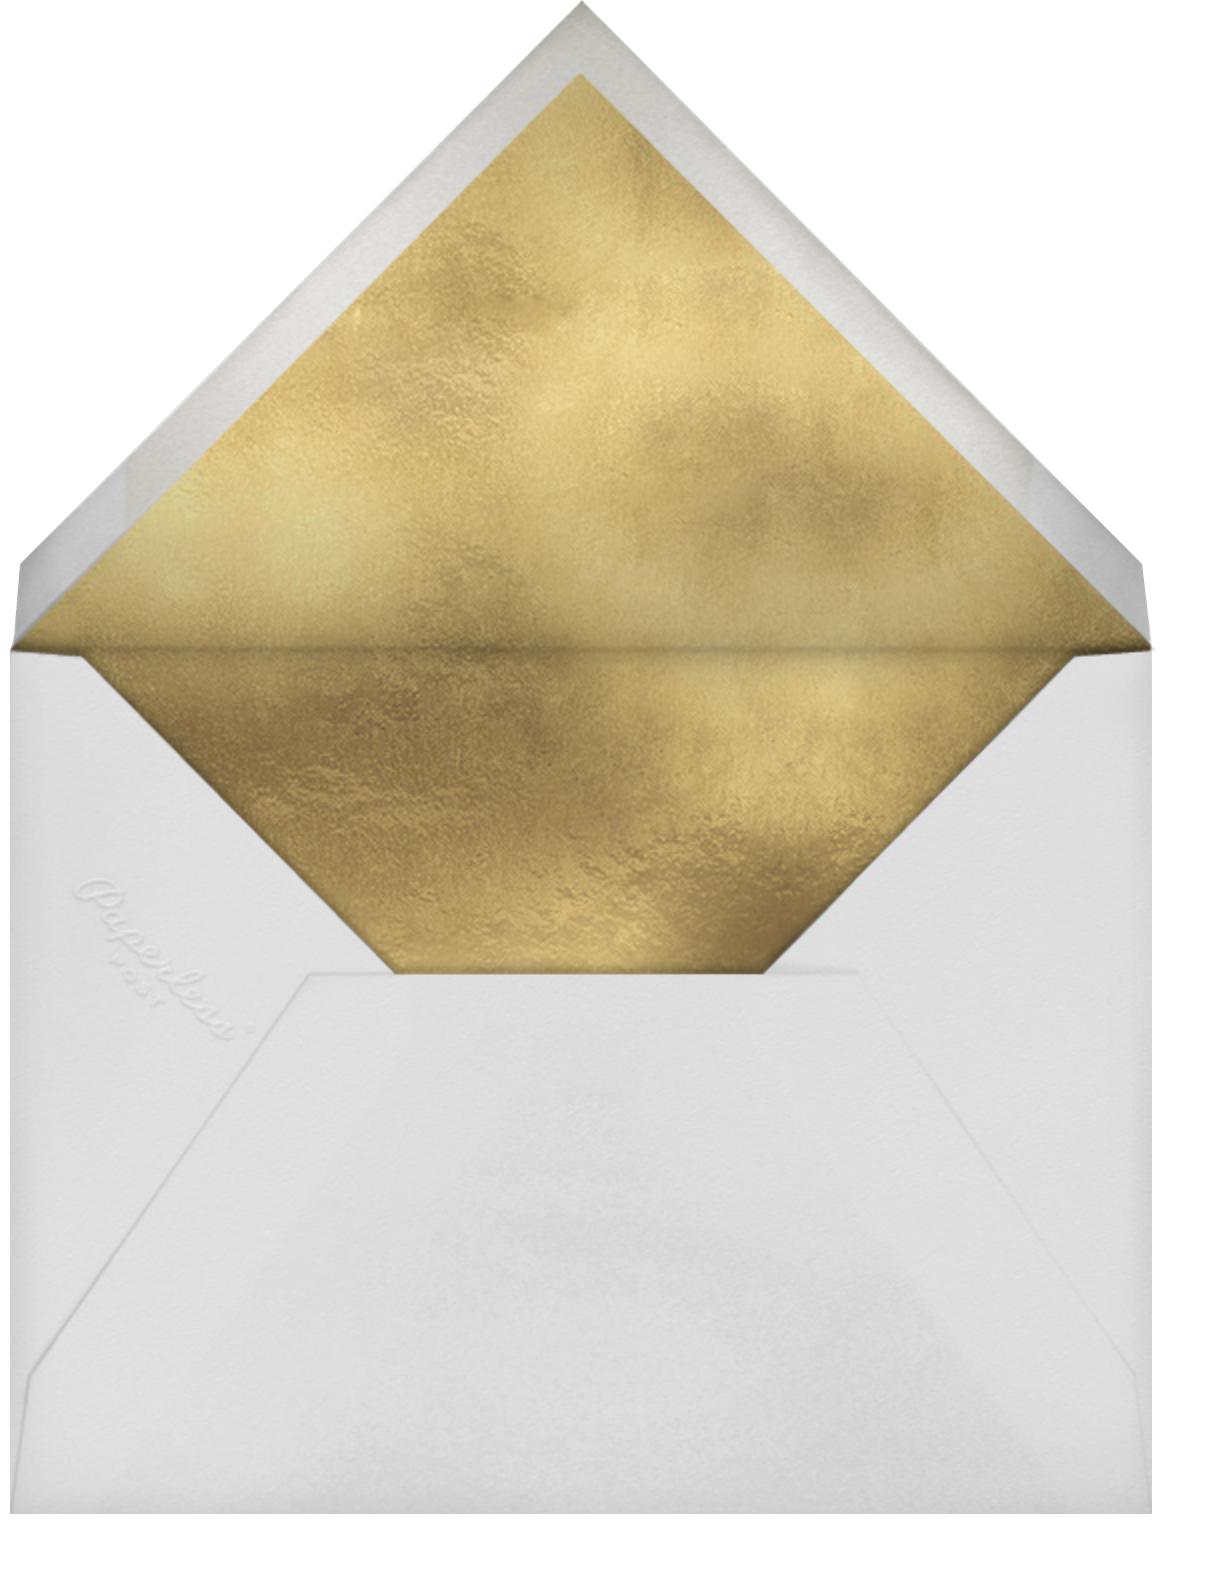 Tower Power - kate spade new york - Envelope